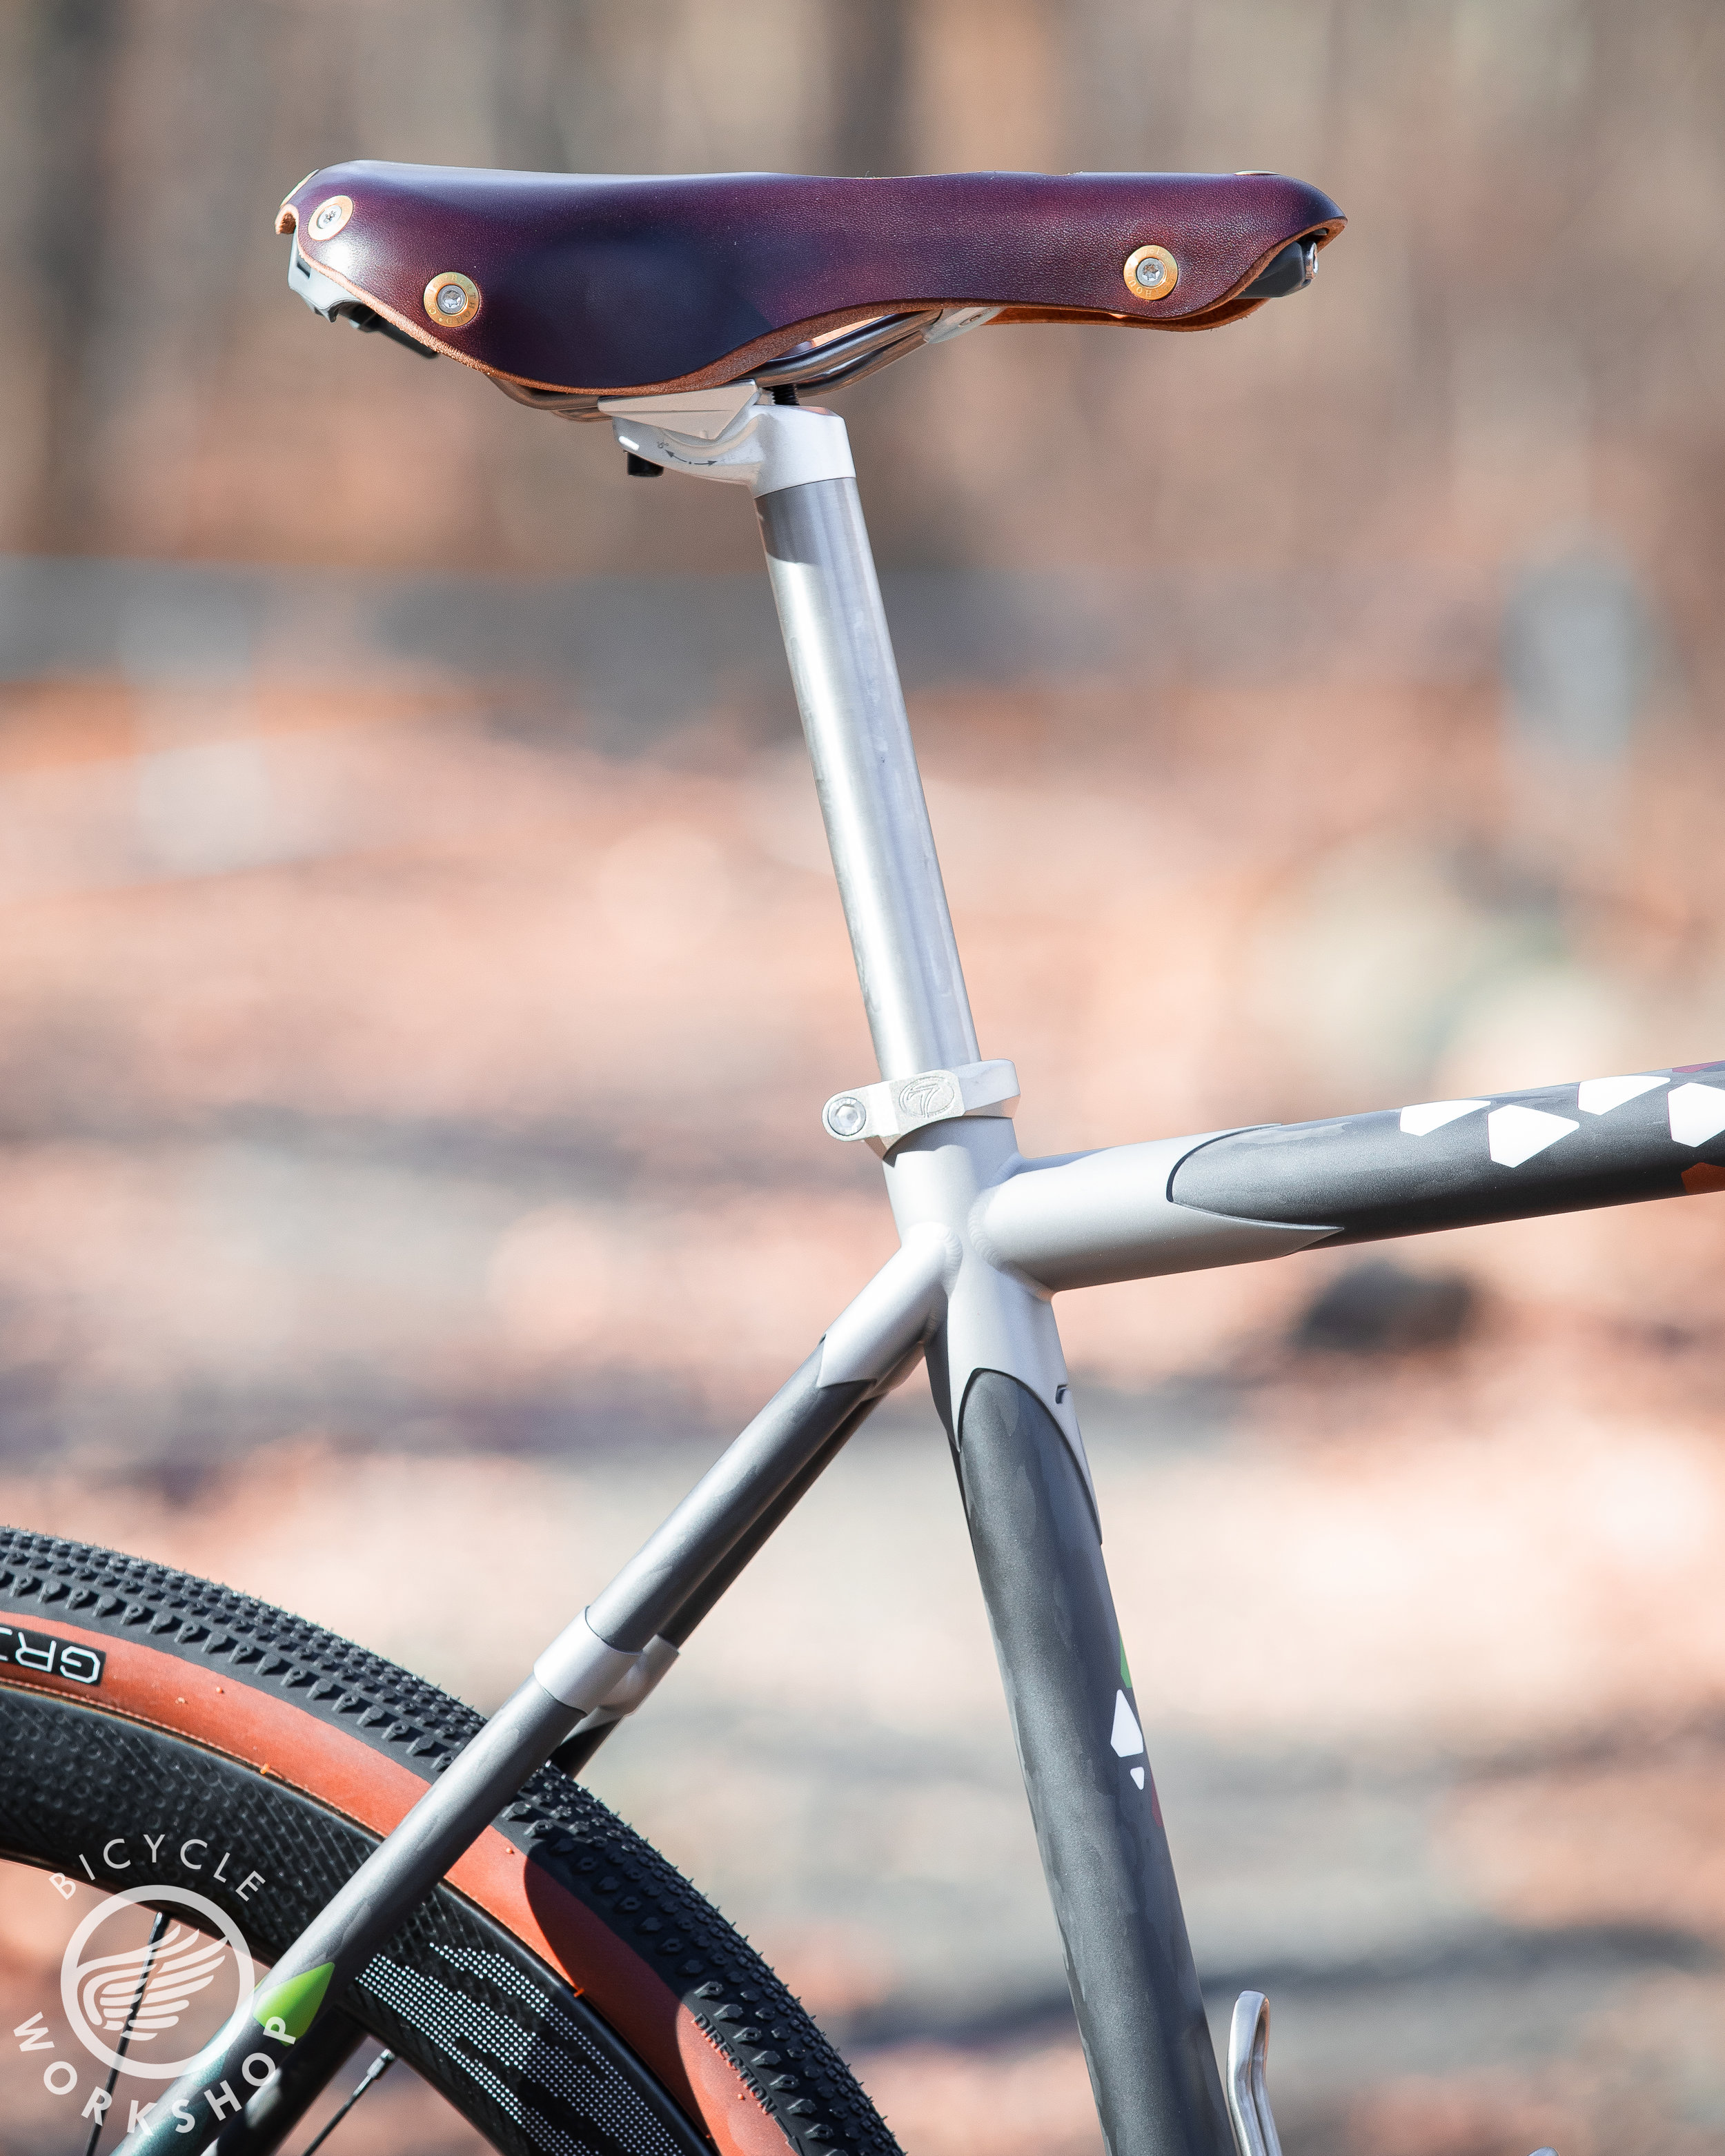 Berthoud saddle is comfy and elegant